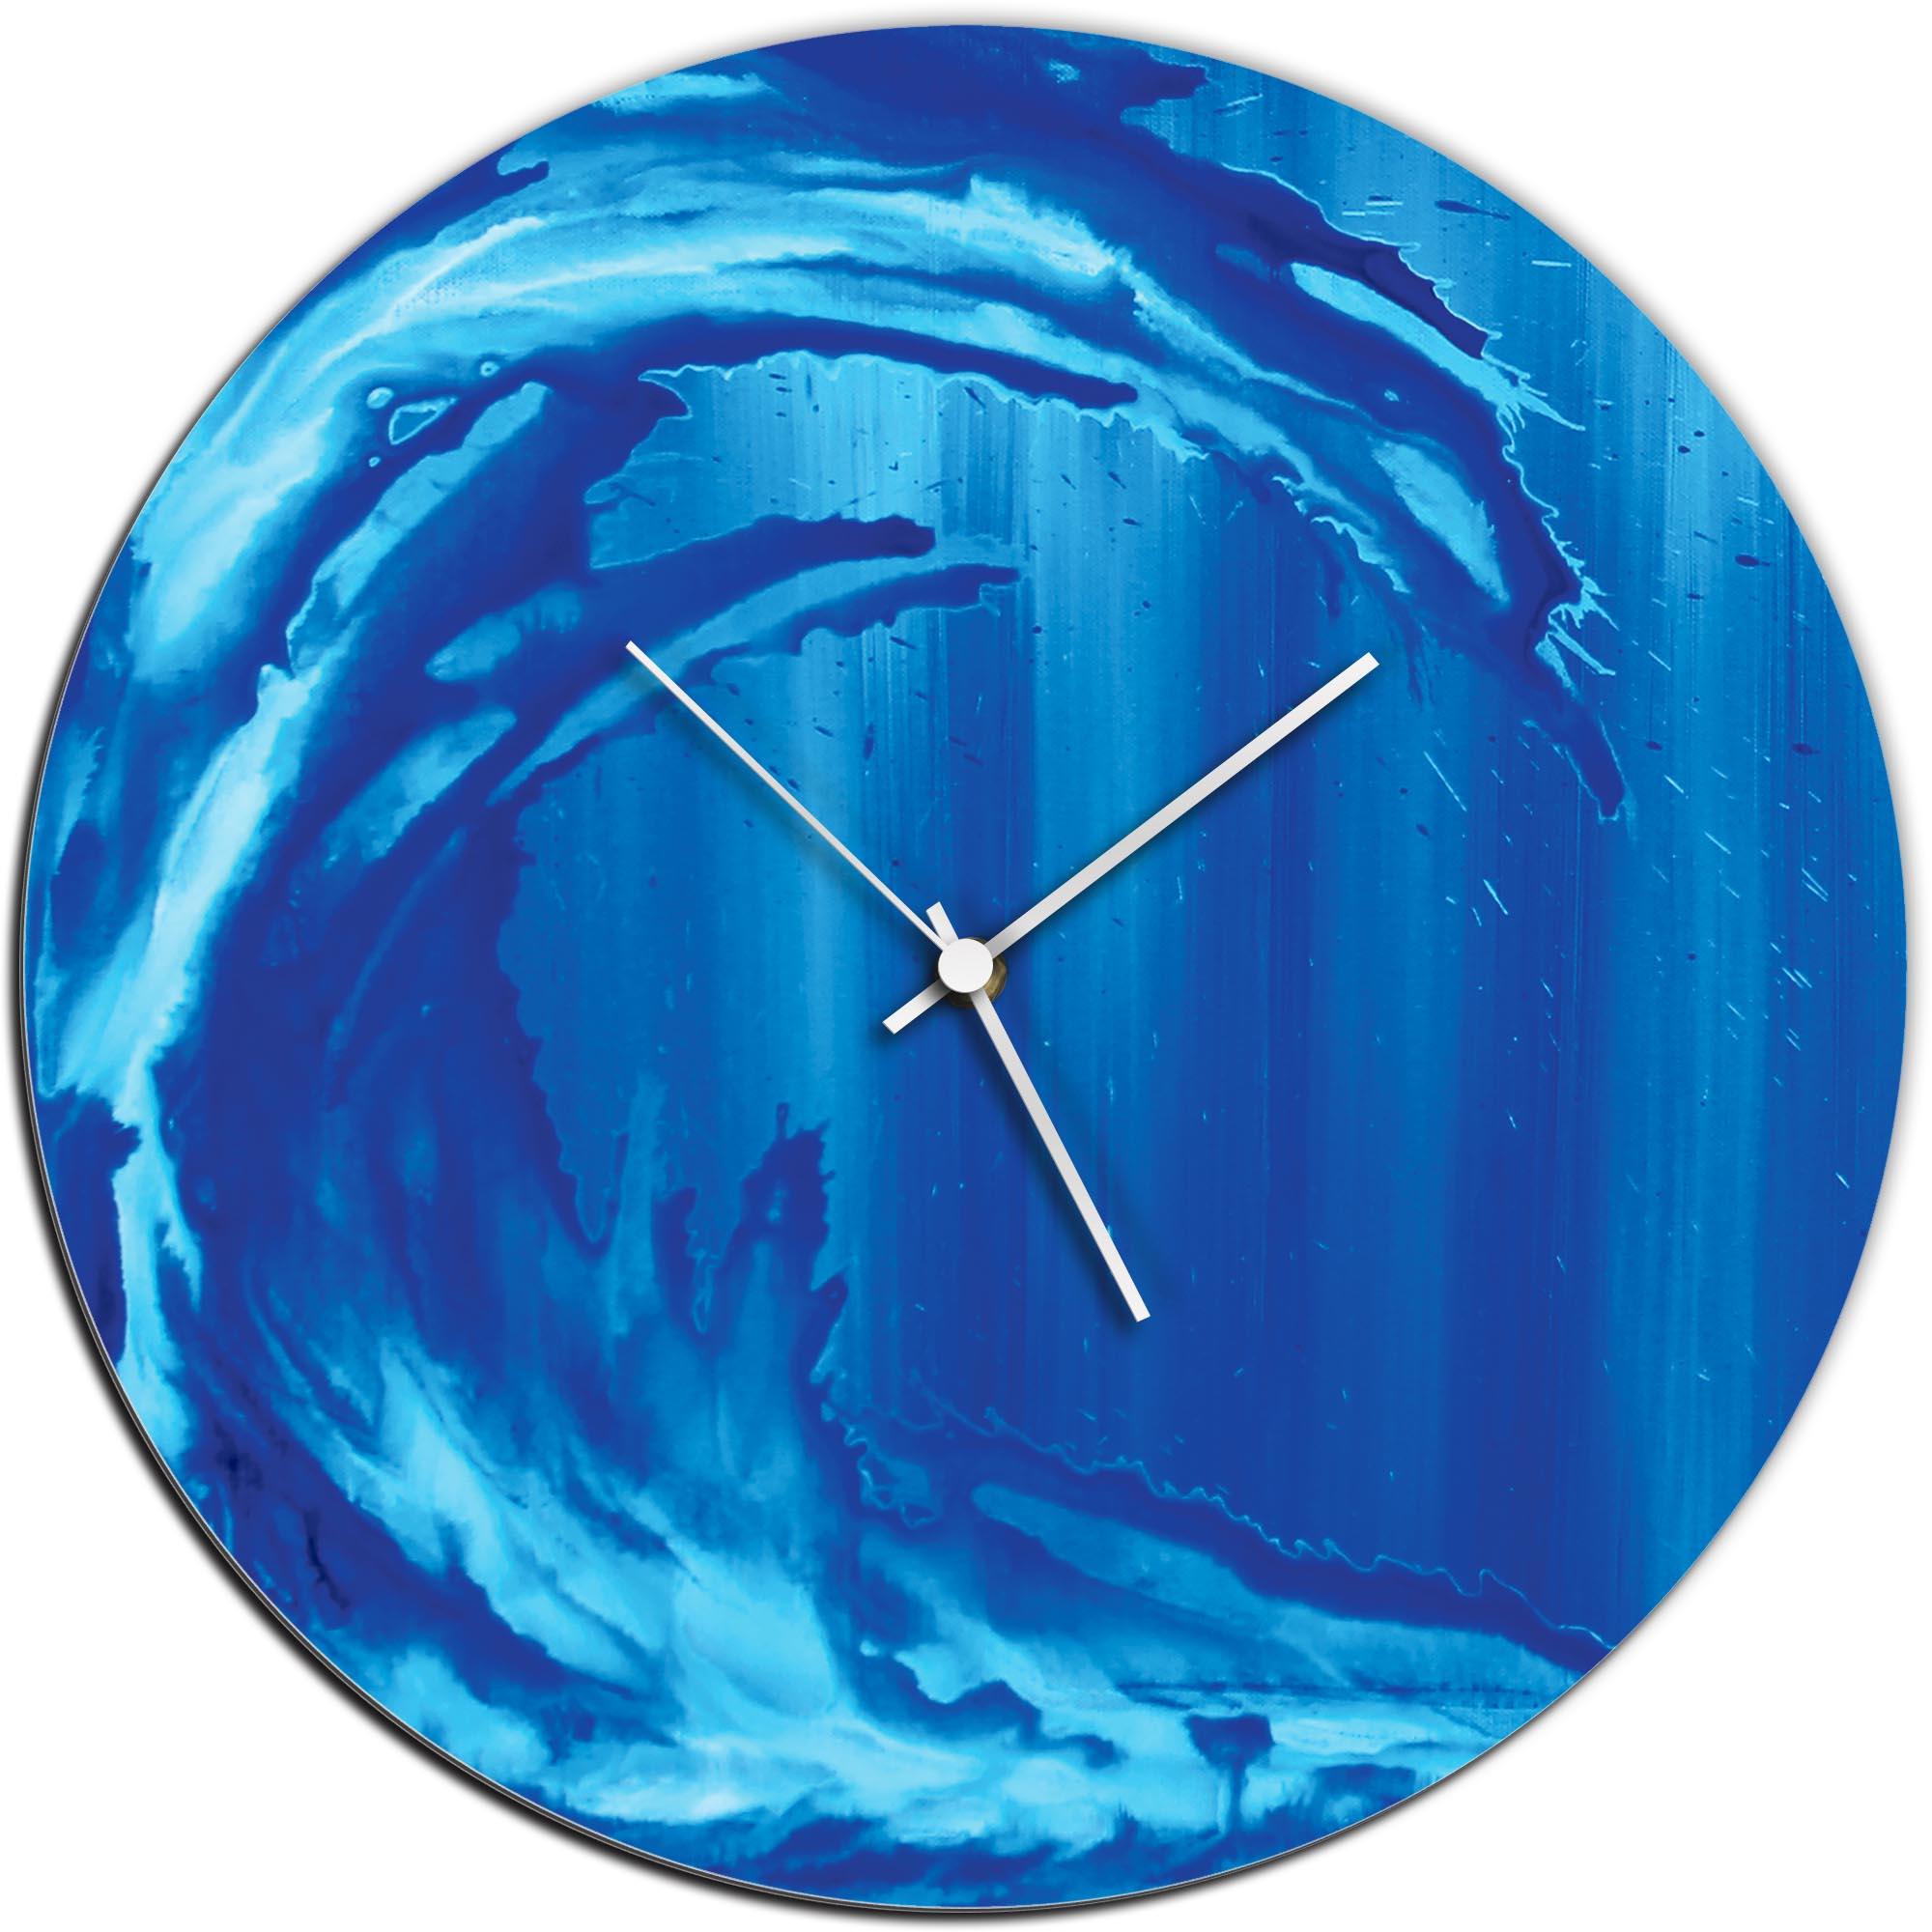 Mendo Vasilevski 'Ocean Wave Circle Clock' 16in x 16in Modern Wall Clock on Aluminum Composite